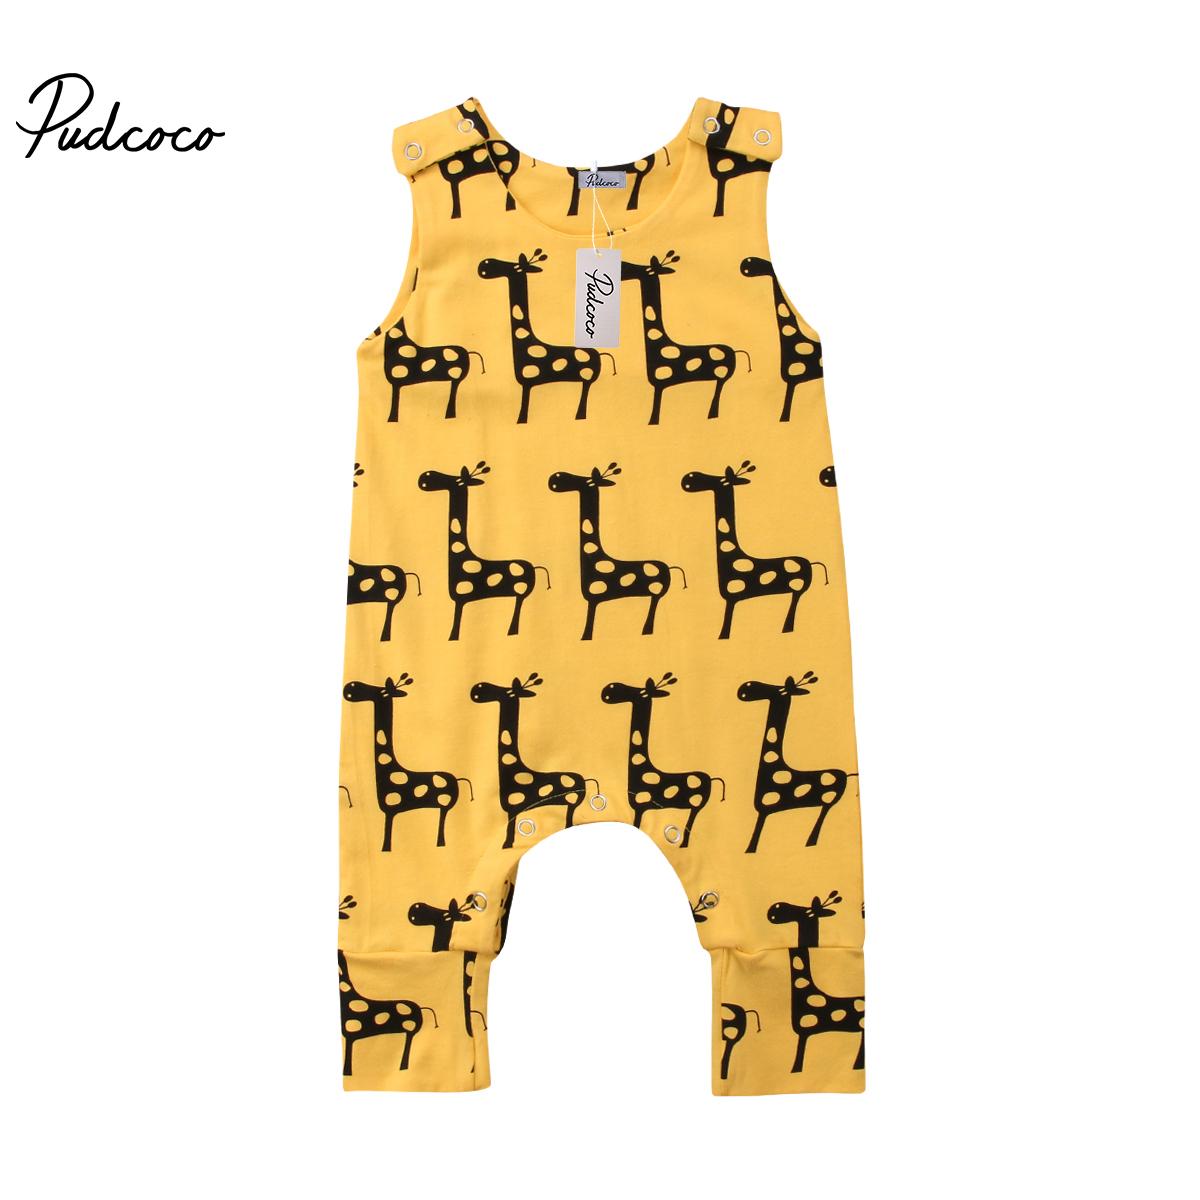 2020 Brand New 0 24M Cute Newborn Baby Boy Girl Sleeveless Cartoon Animal Cotton Romper Jumpsuit Outfits Summer Clothes